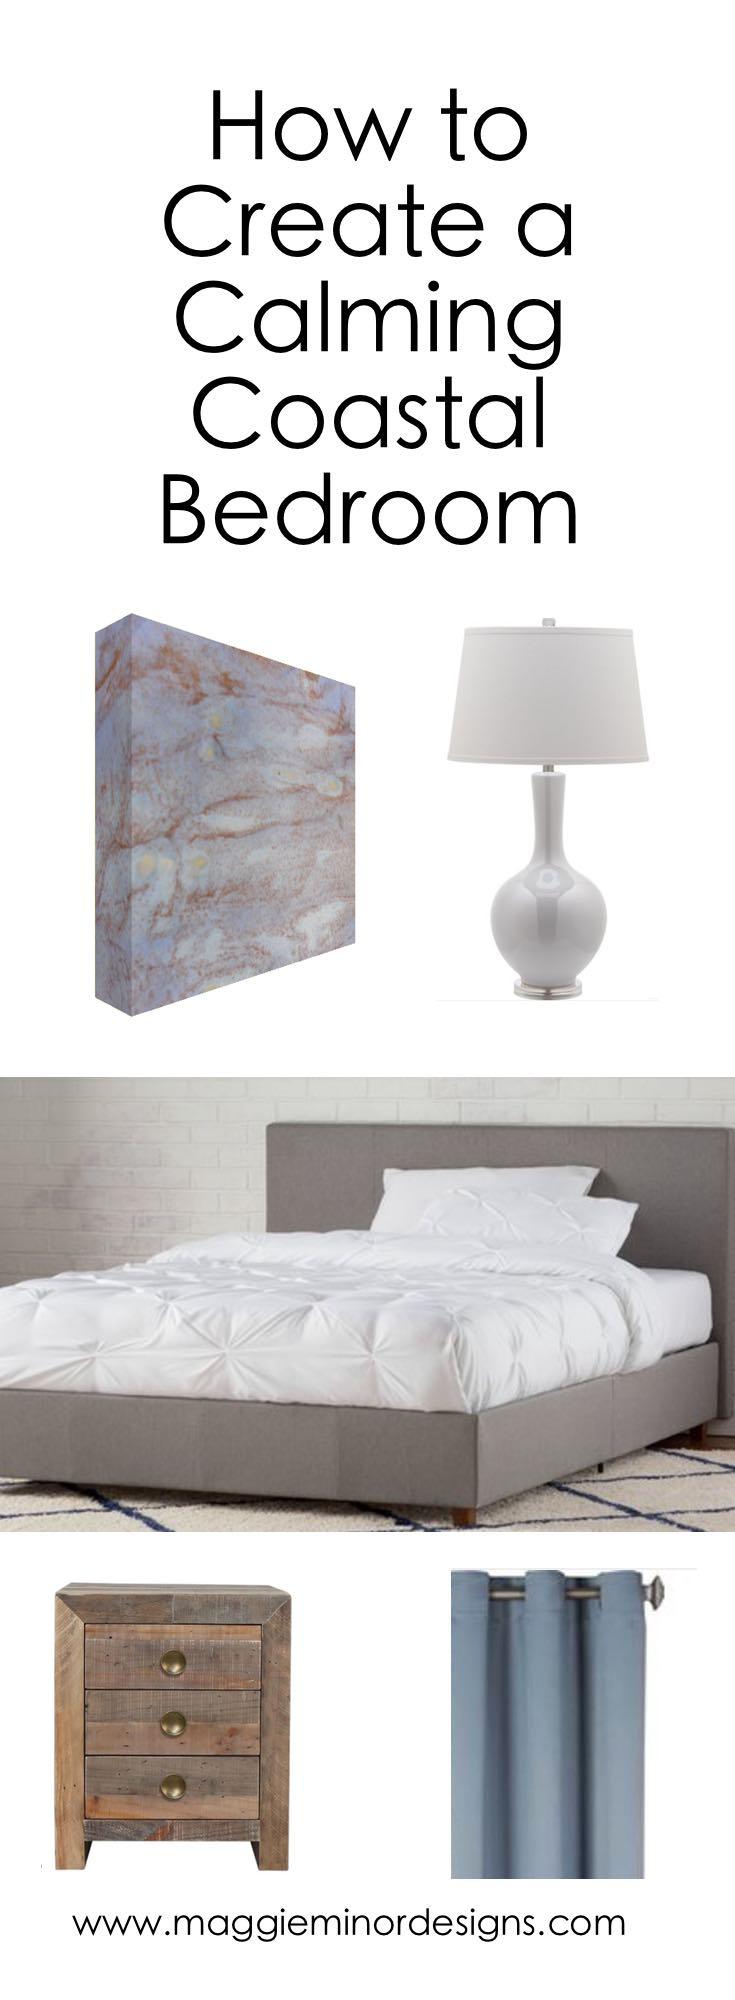 How to Create a Calming Coastal Bedroom